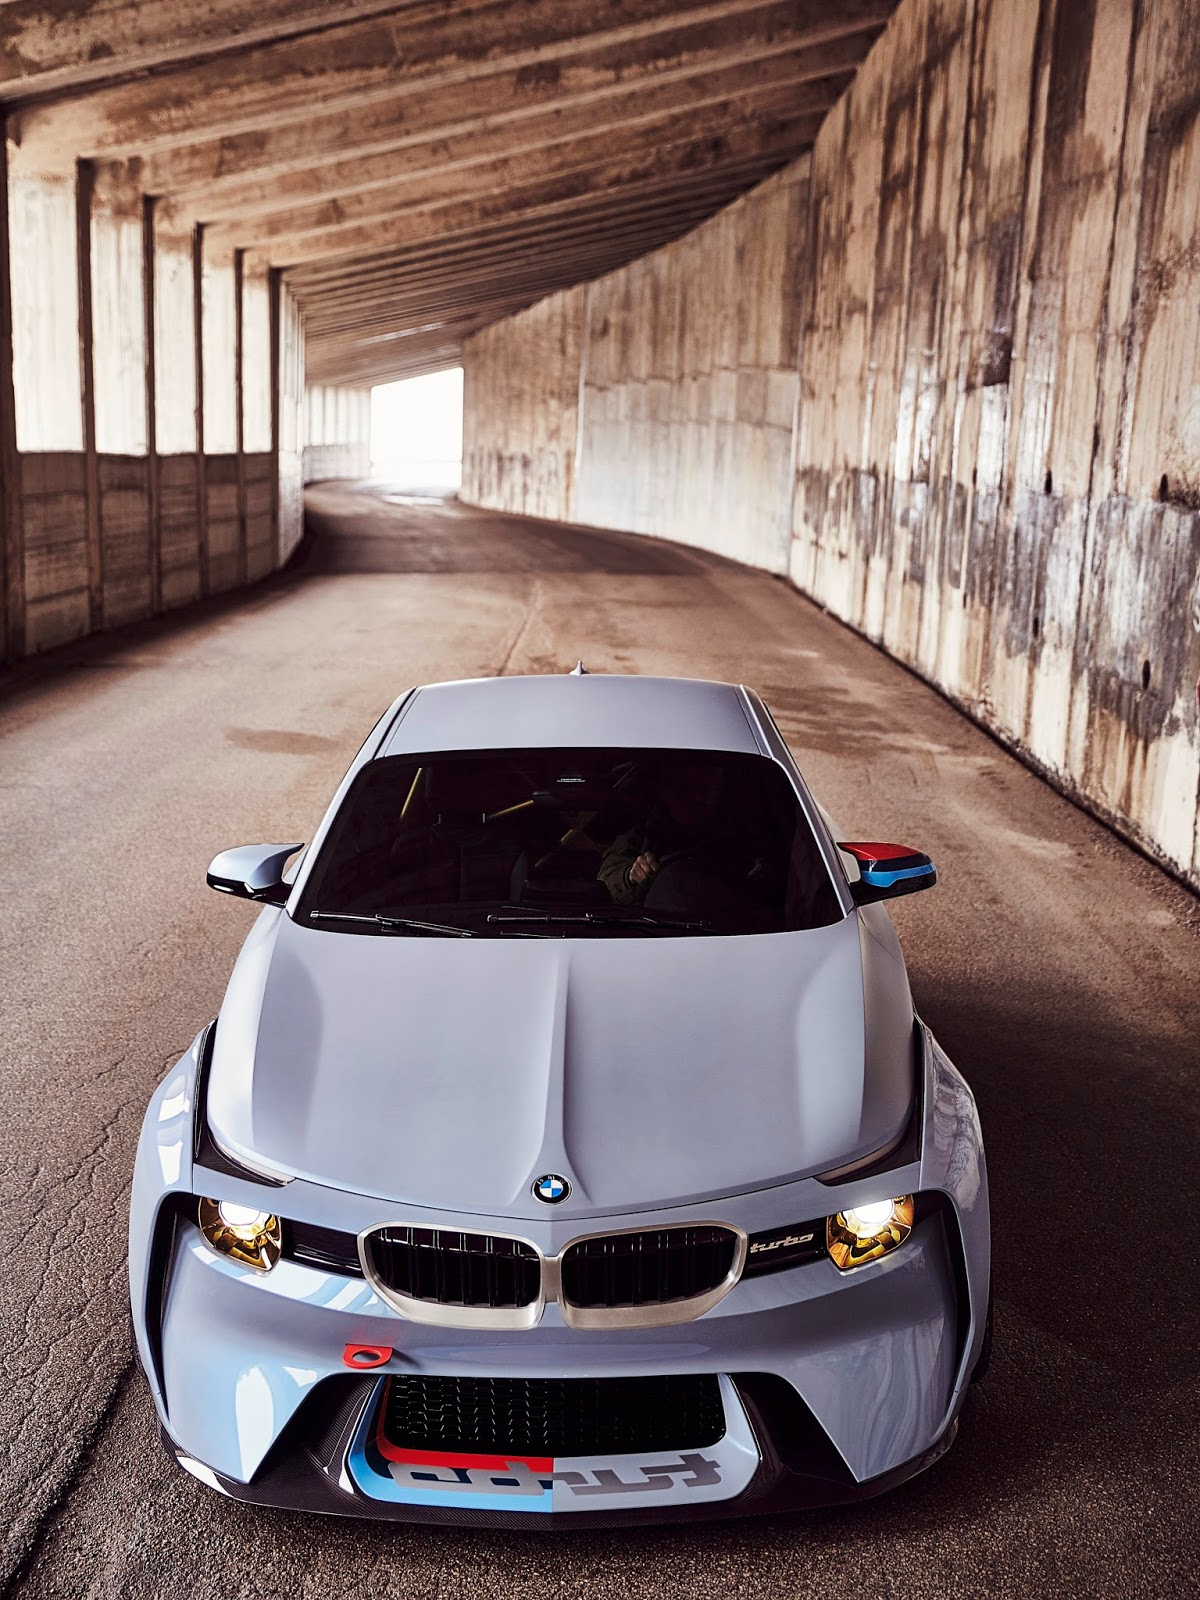 P90219719 highRes bmw 2002 hommage 05 1 1 H BMW γιορτάζει τα 50 χρόνια της θρυλικής 2002 turbo και παρουσιάζει την Bmw 2002 Hommage BMW, BMW 2002, BMW 2002 turbo, BMW Concept, BMW Hommage, supercars, videos